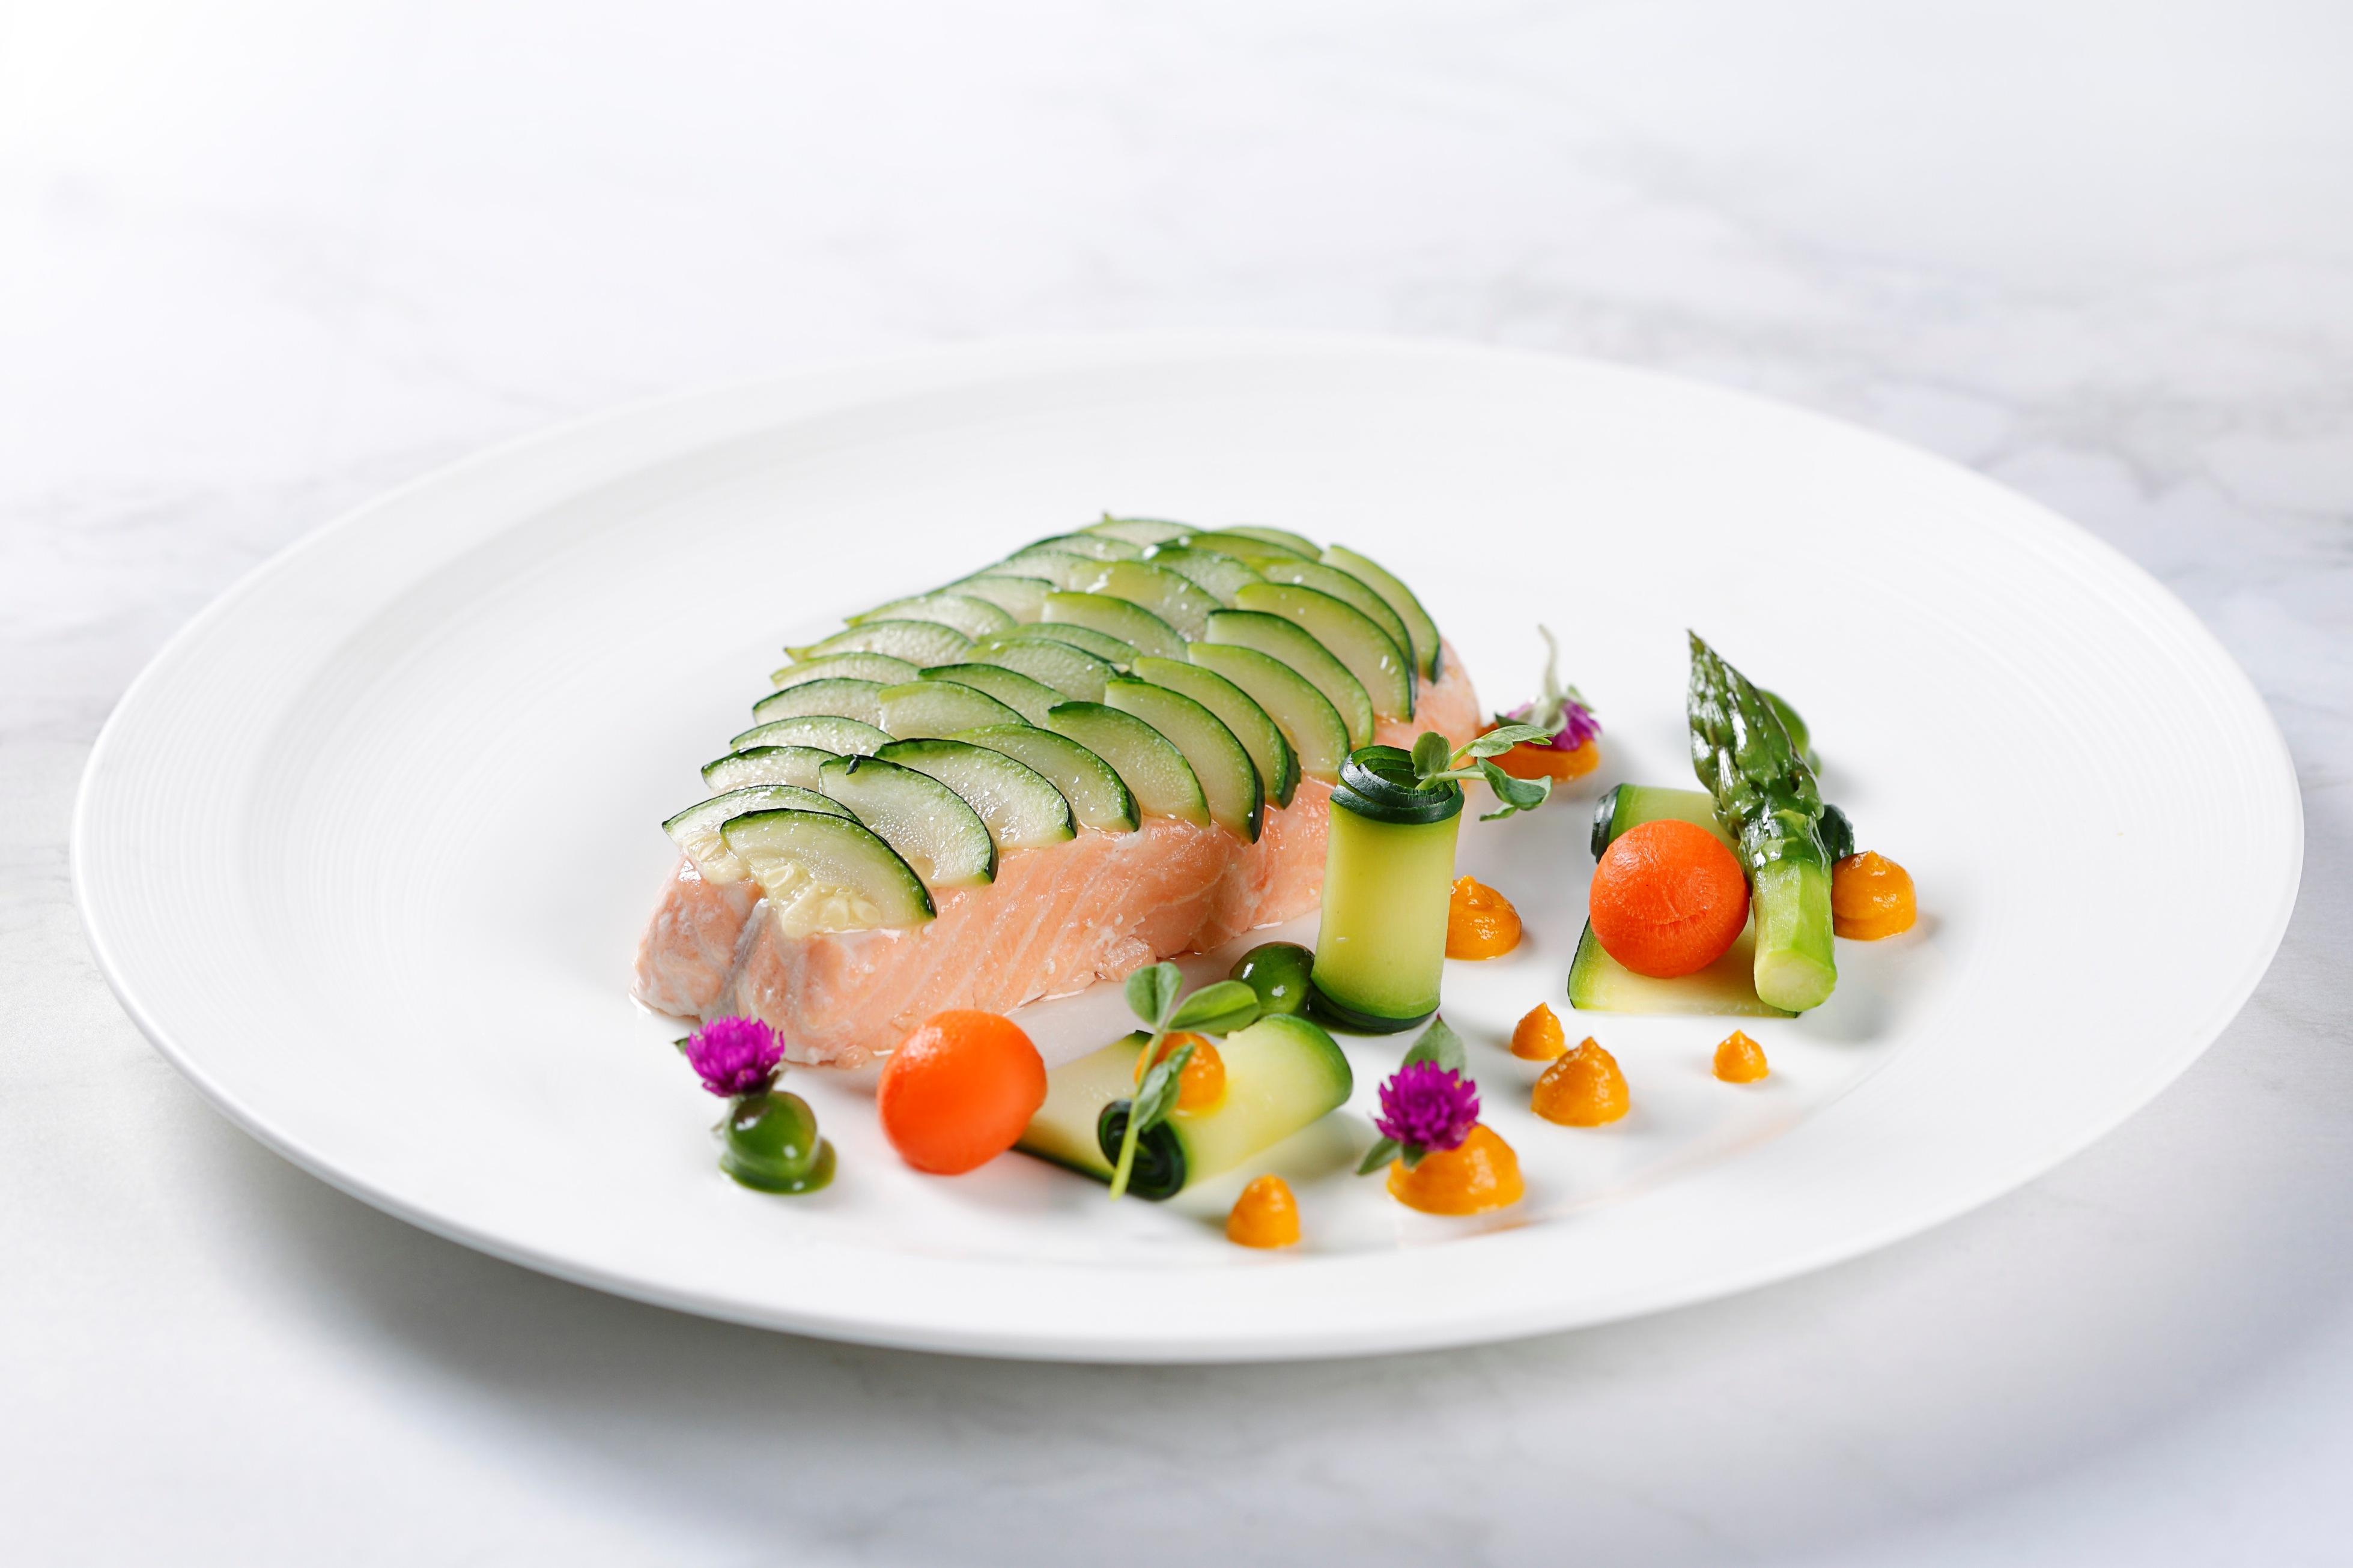 lyon new menu the sous vide salmon food lifestyle. Black Bedroom Furniture Sets. Home Design Ideas